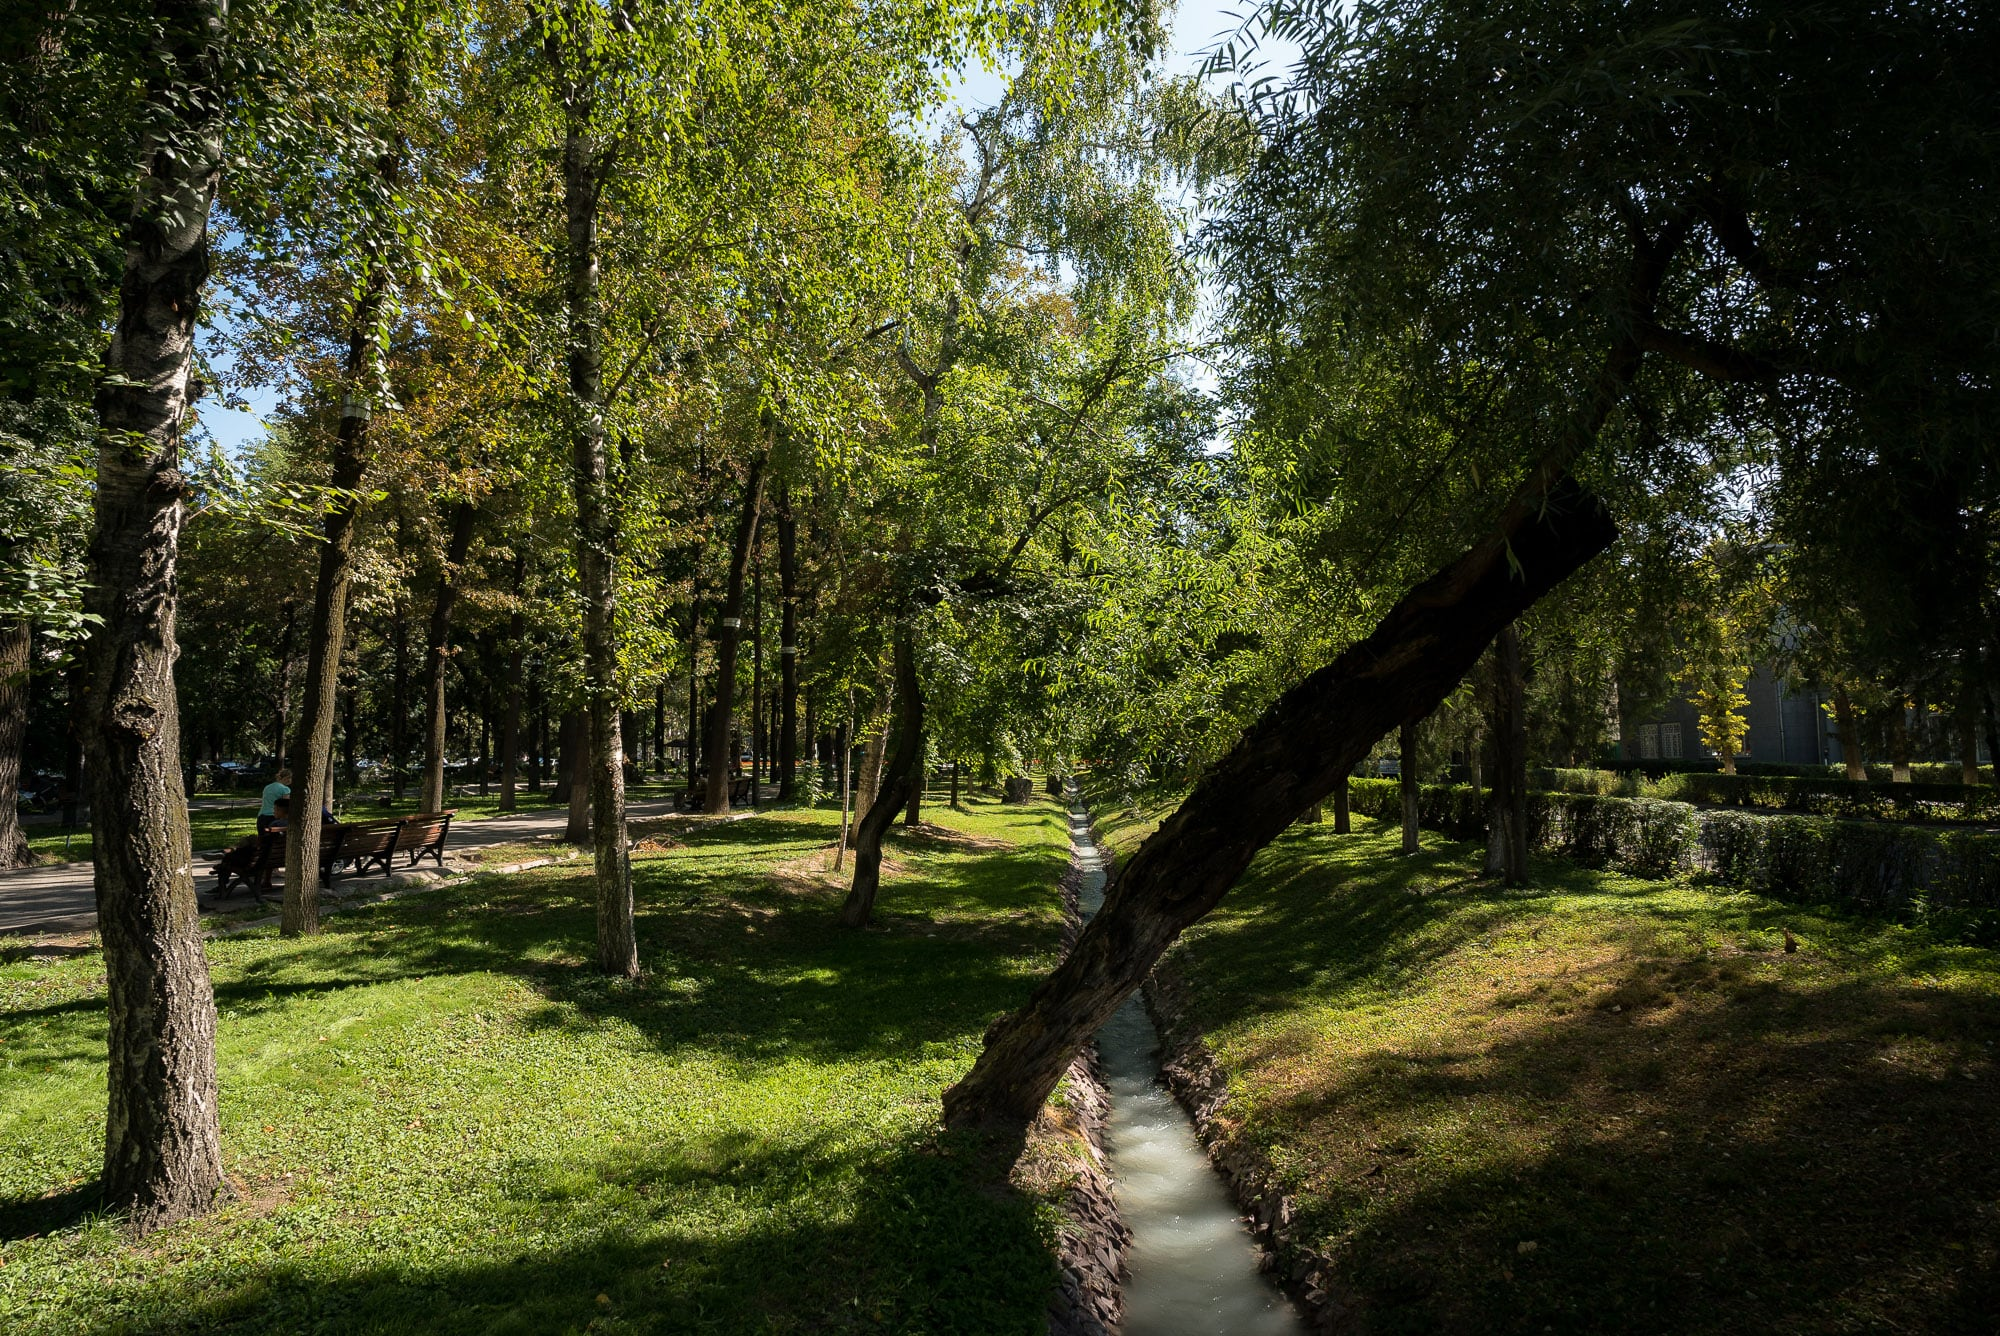 Bishkek in the summer